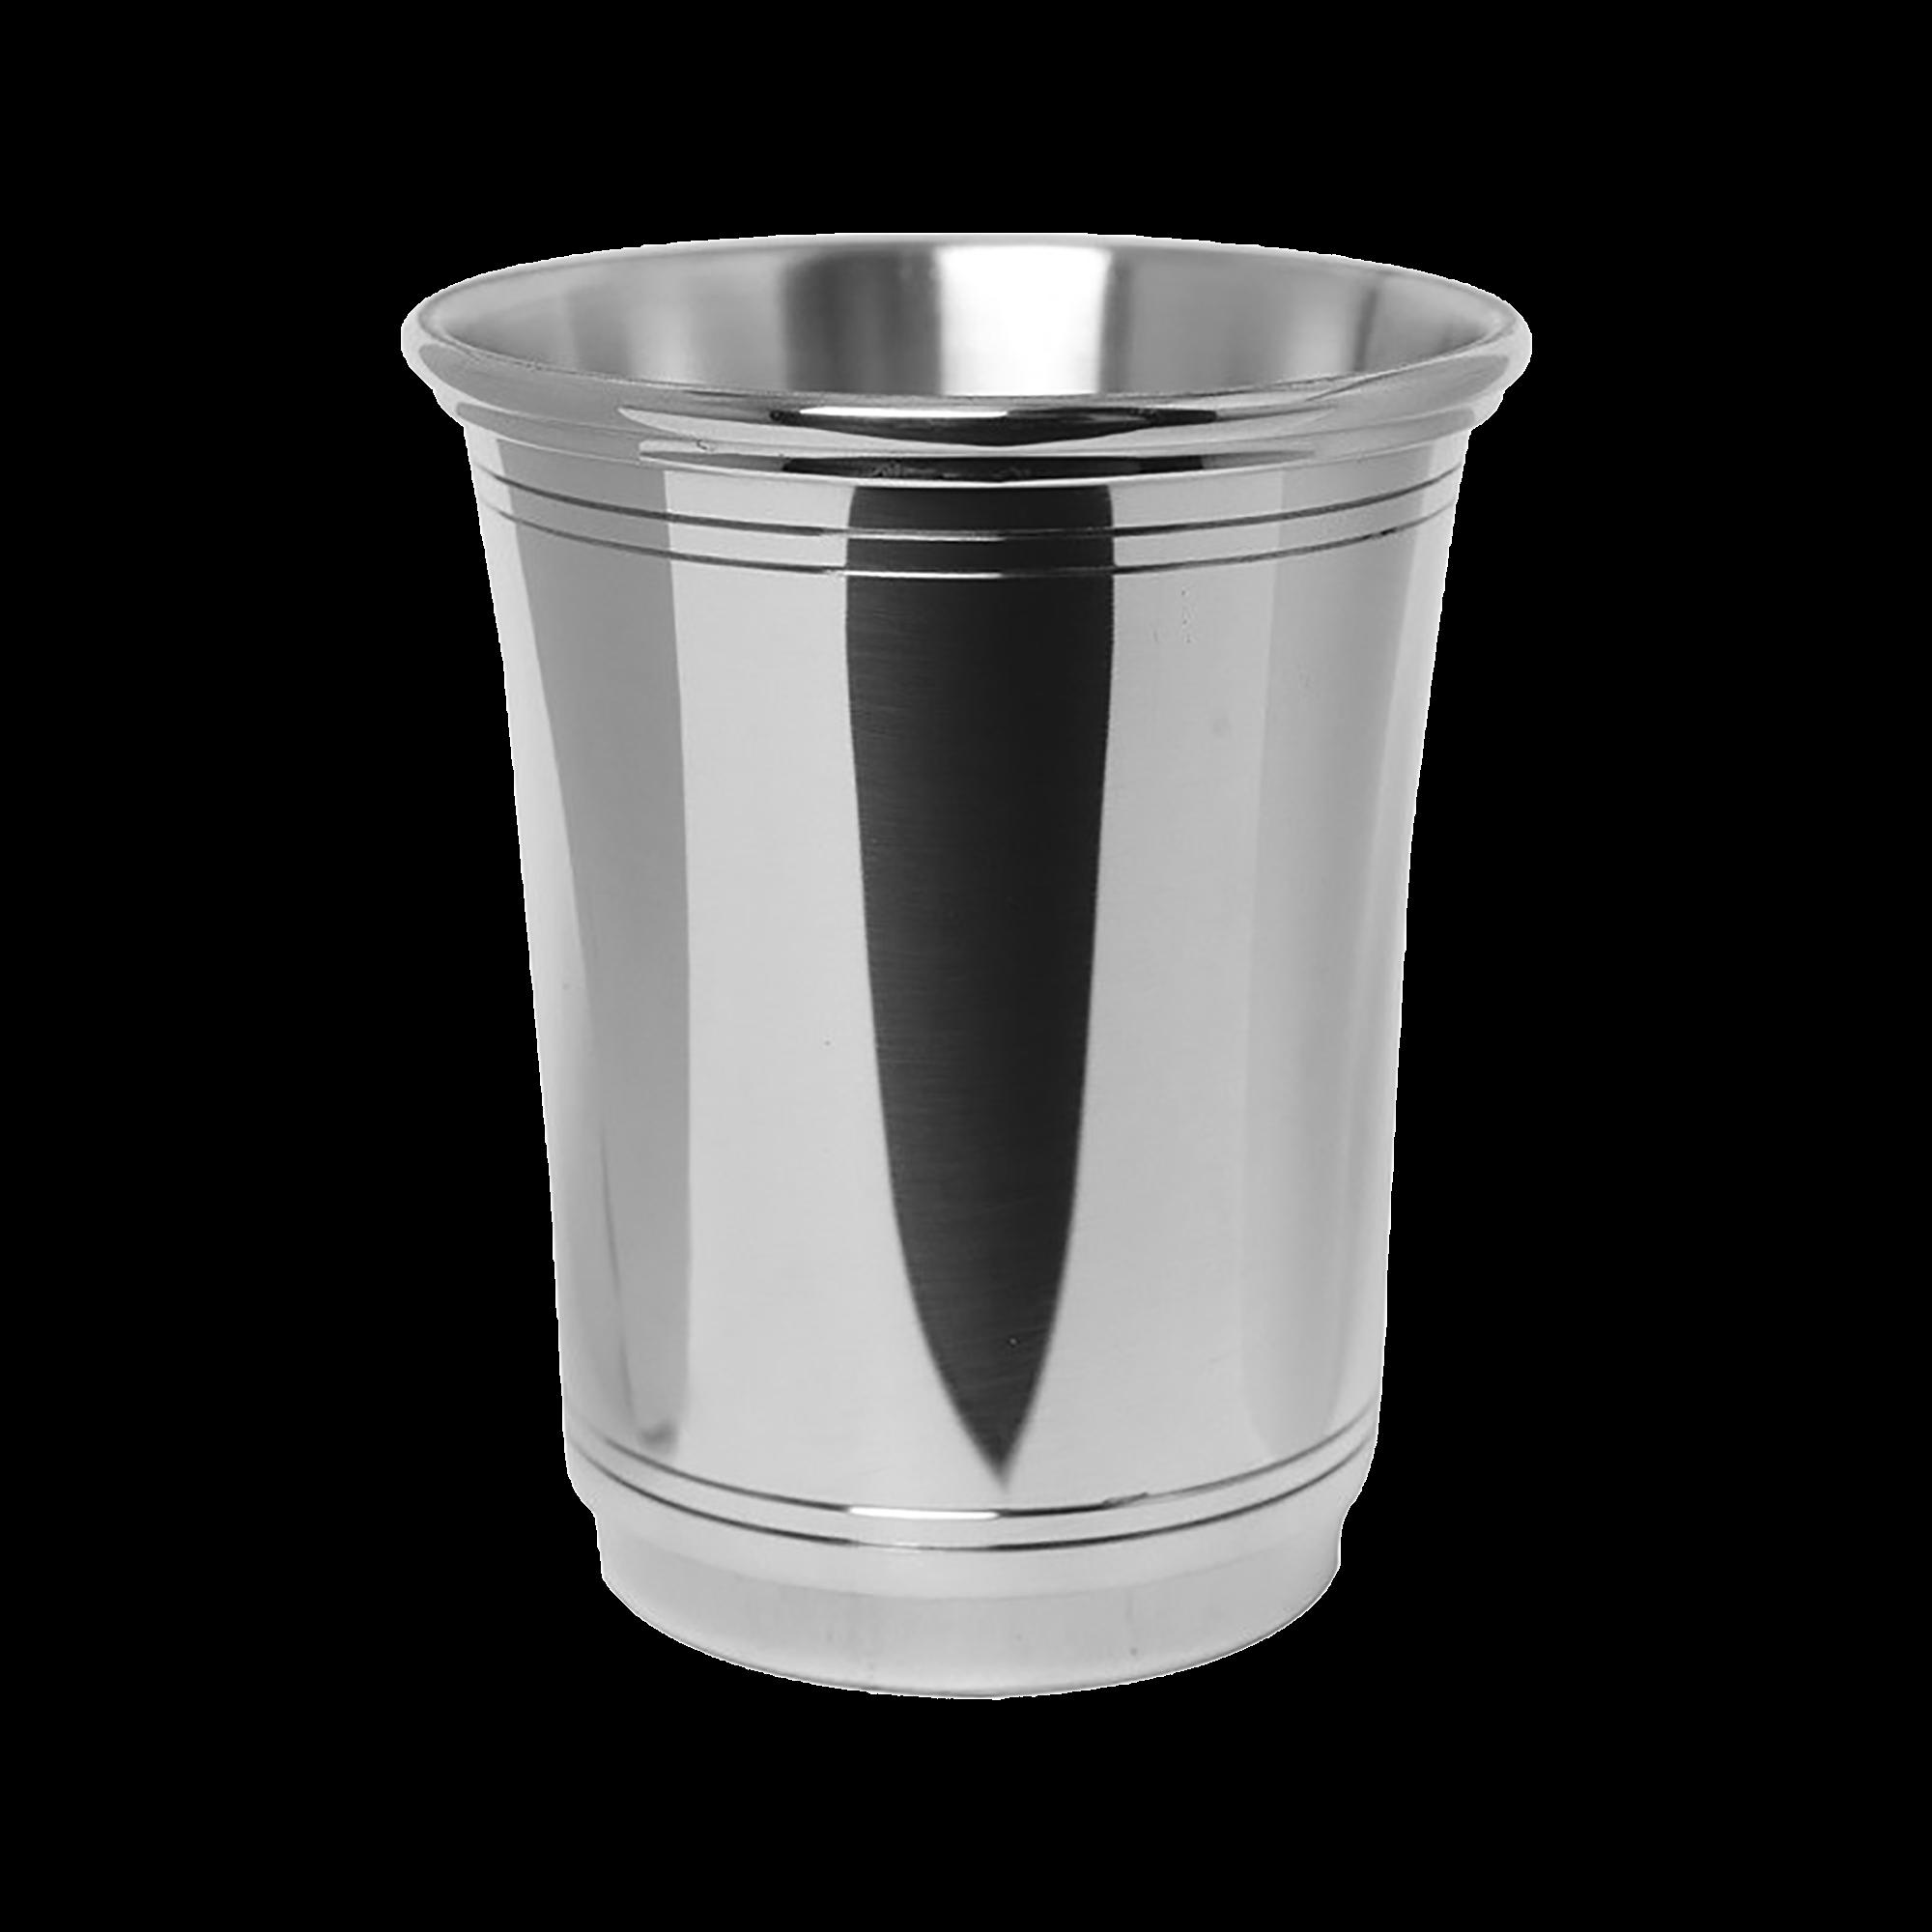 Monogrammed Mint Julep Cups